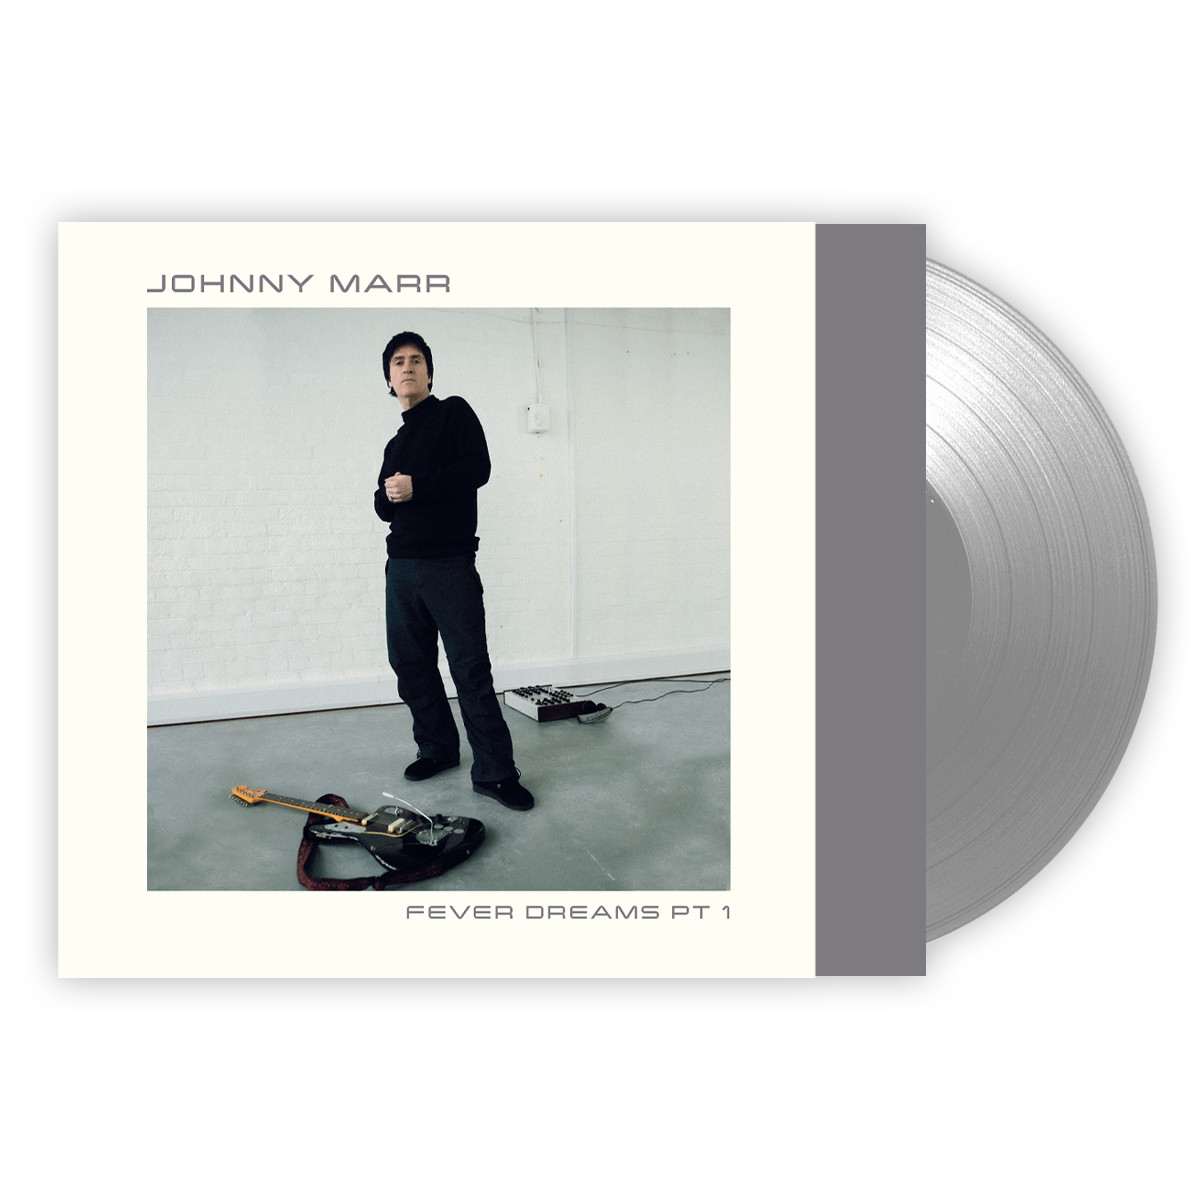 Fever Dreams Pt 1 (Store Exclusive Silver Vinyl)